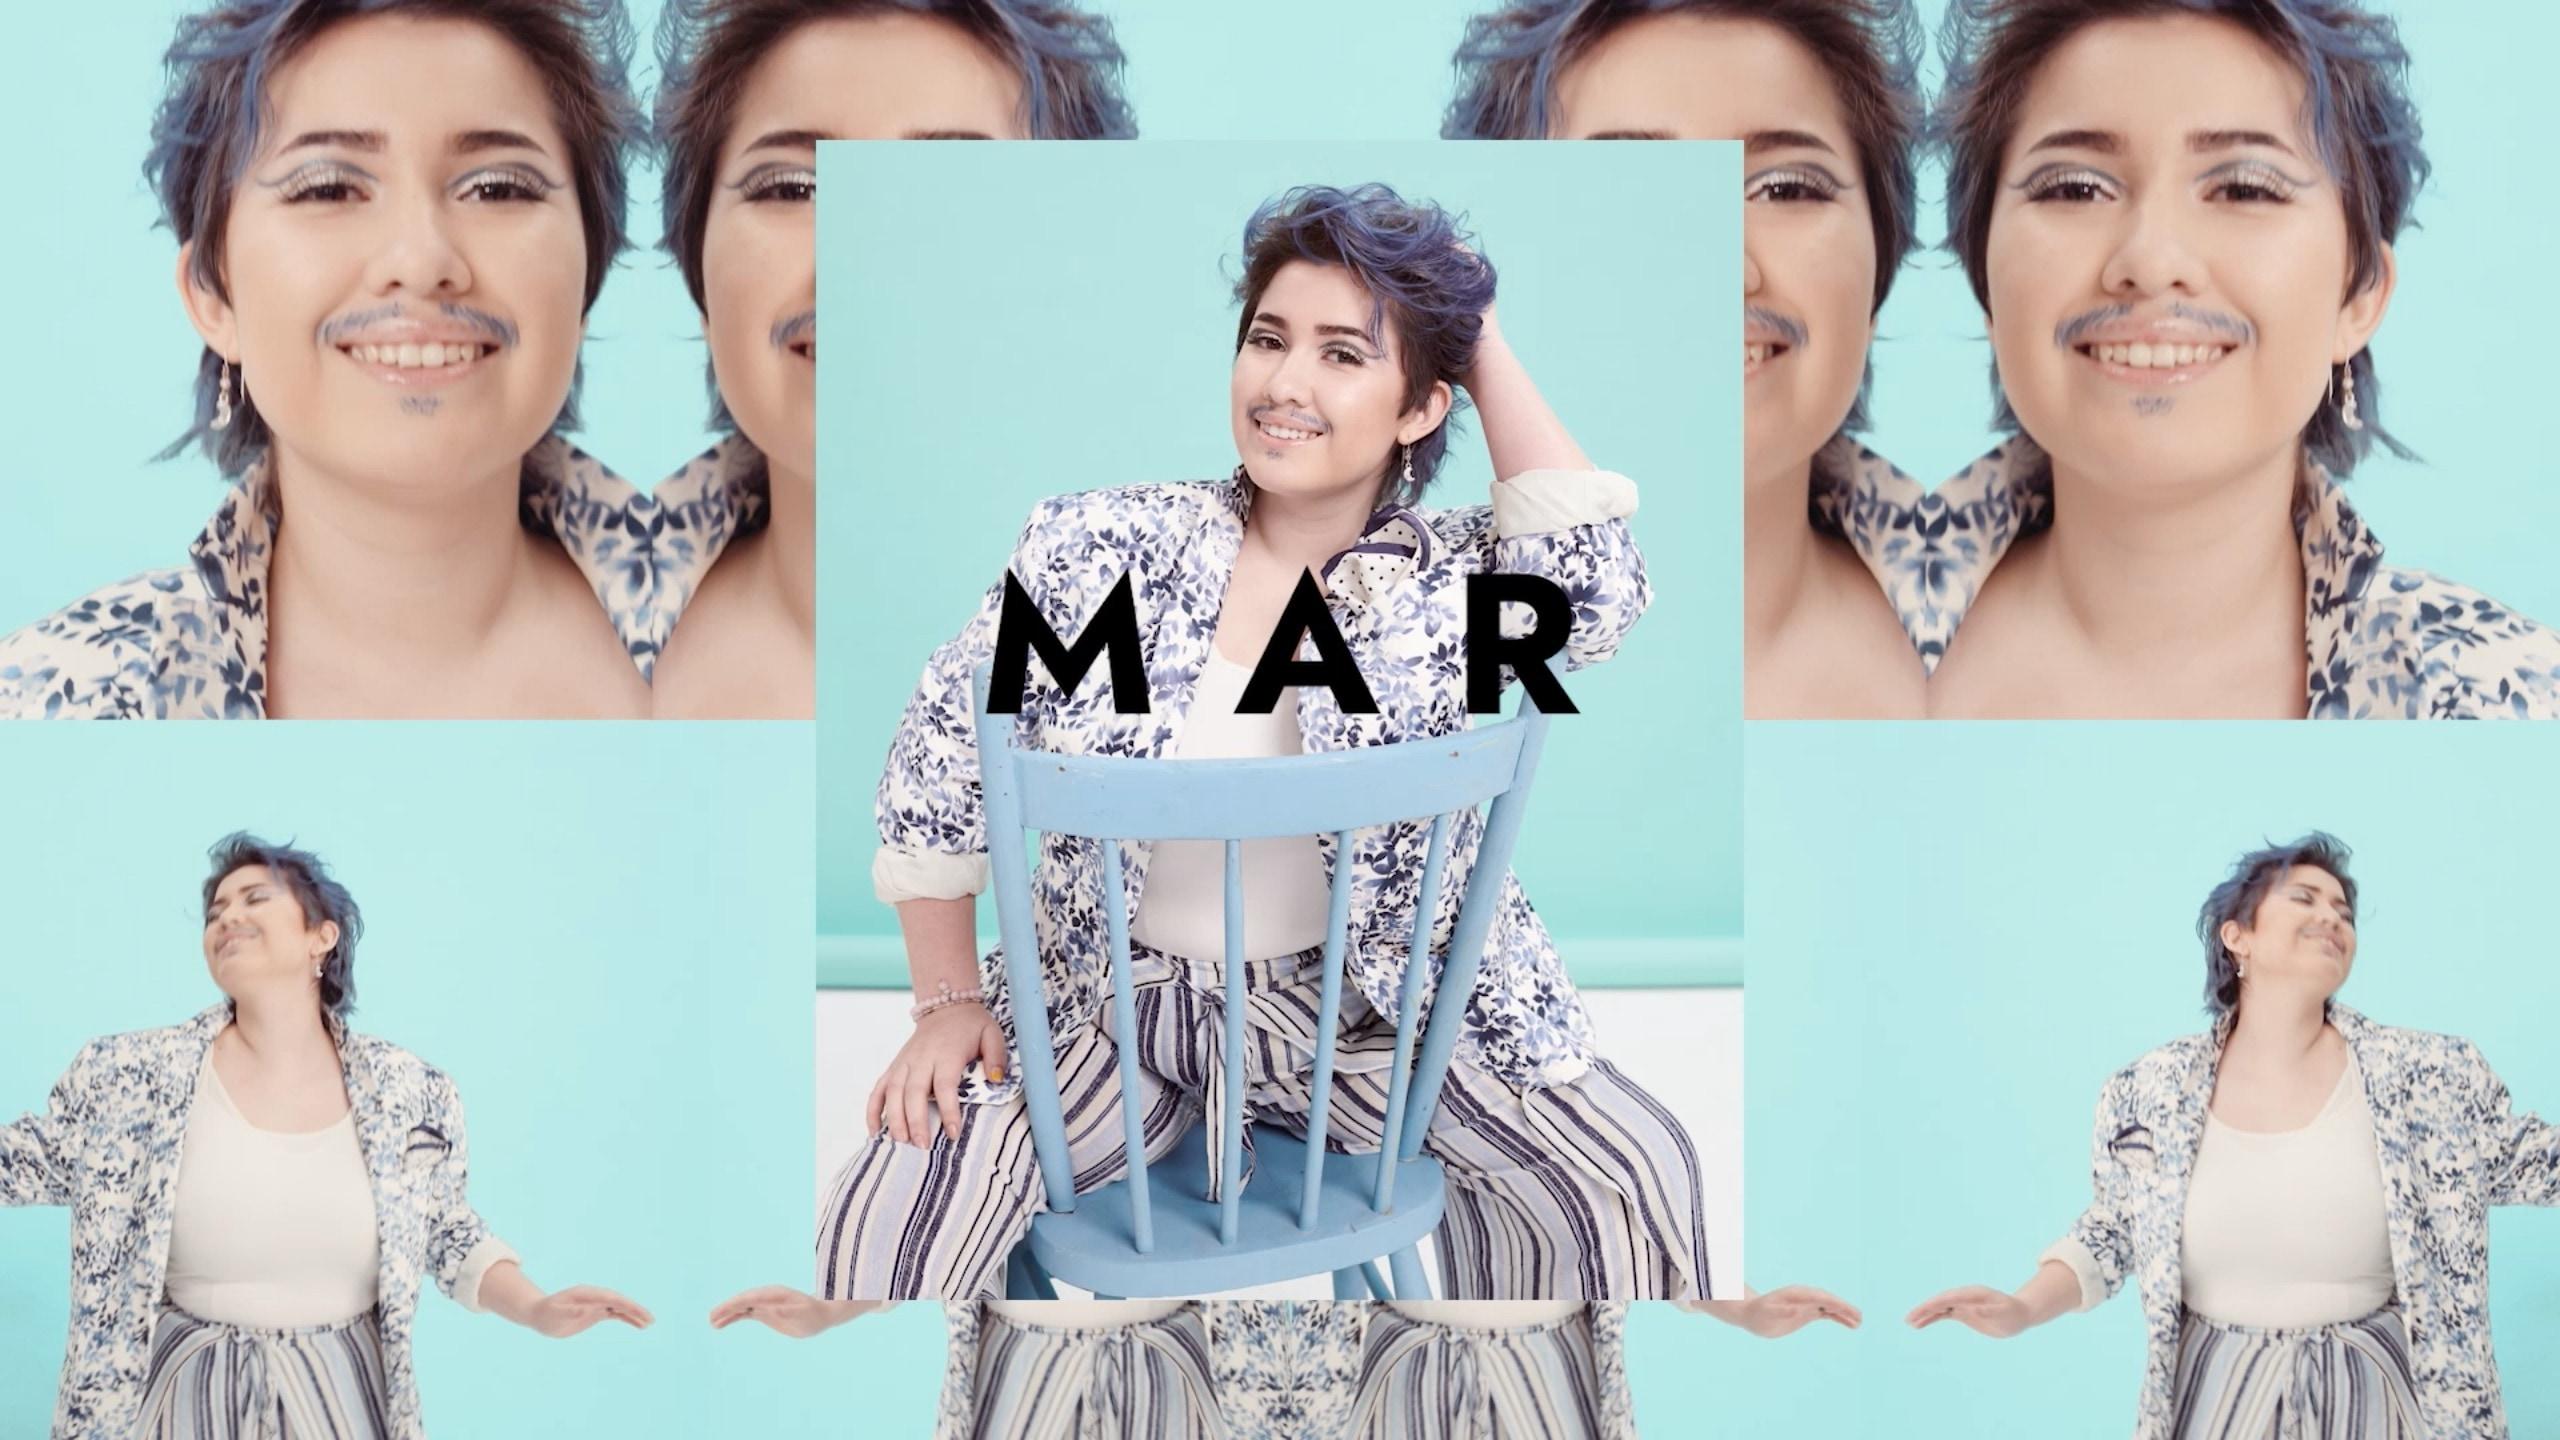 Watch Mar discuss Hispanic Heritage Month